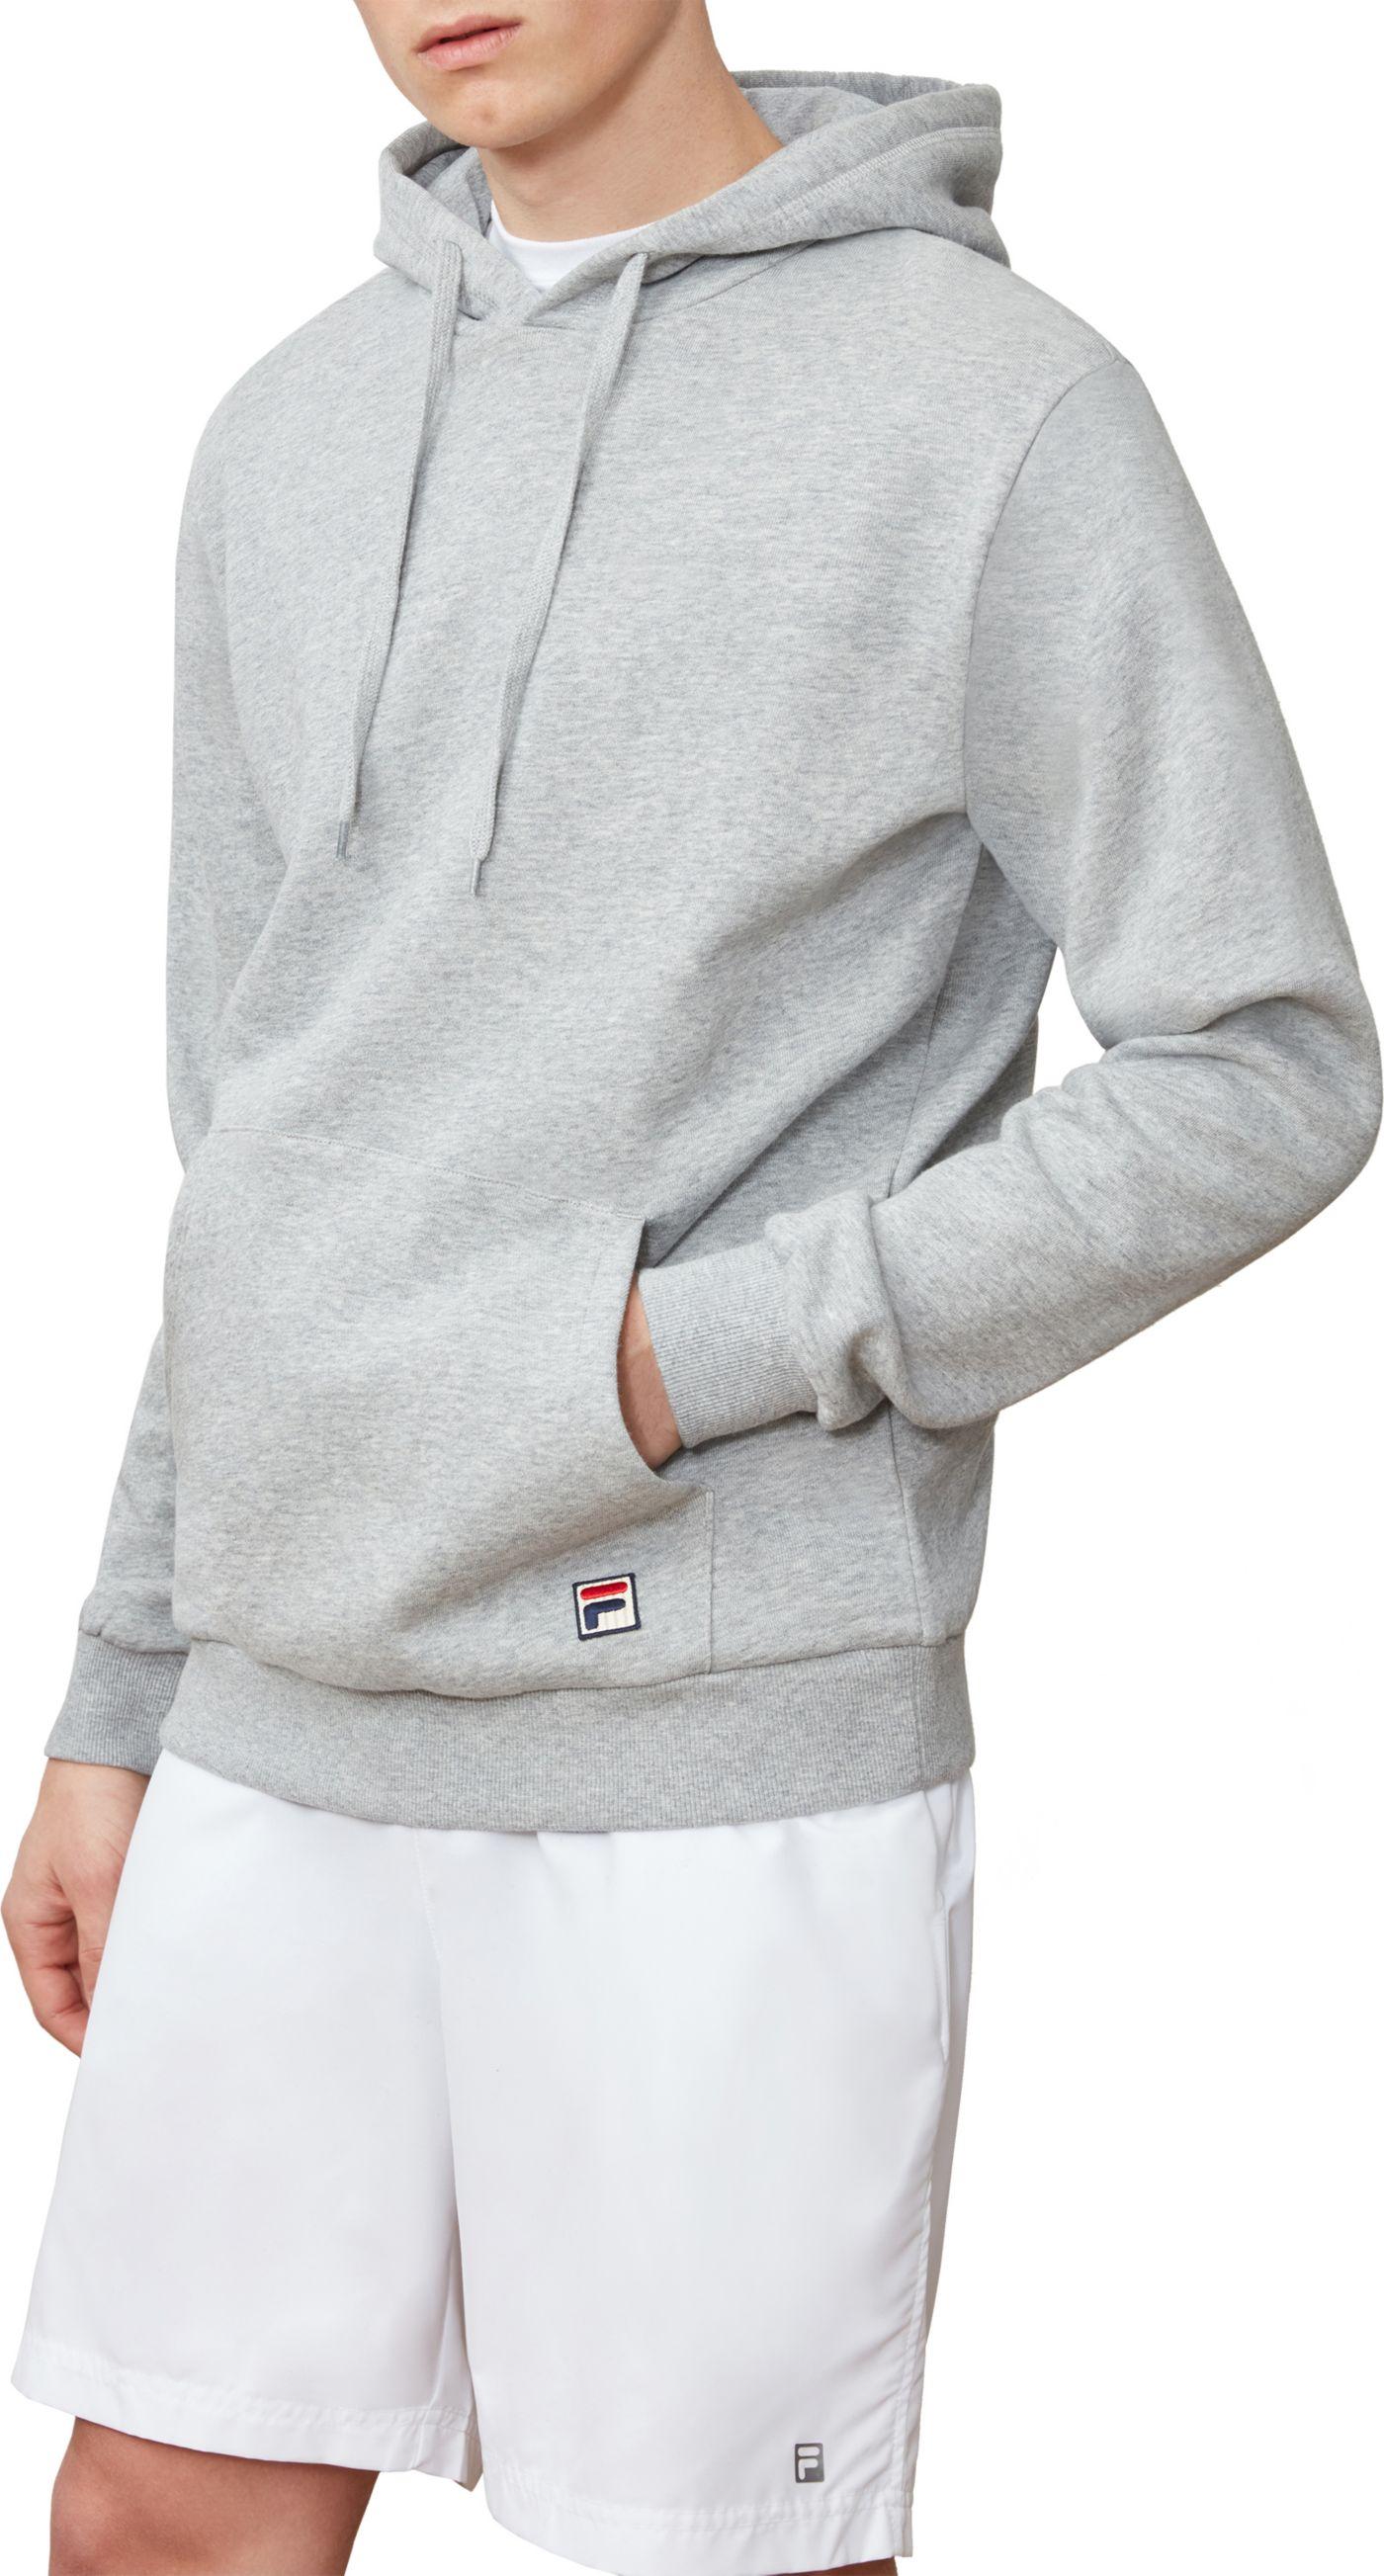 FILA Men's Core Tennis Hoodie